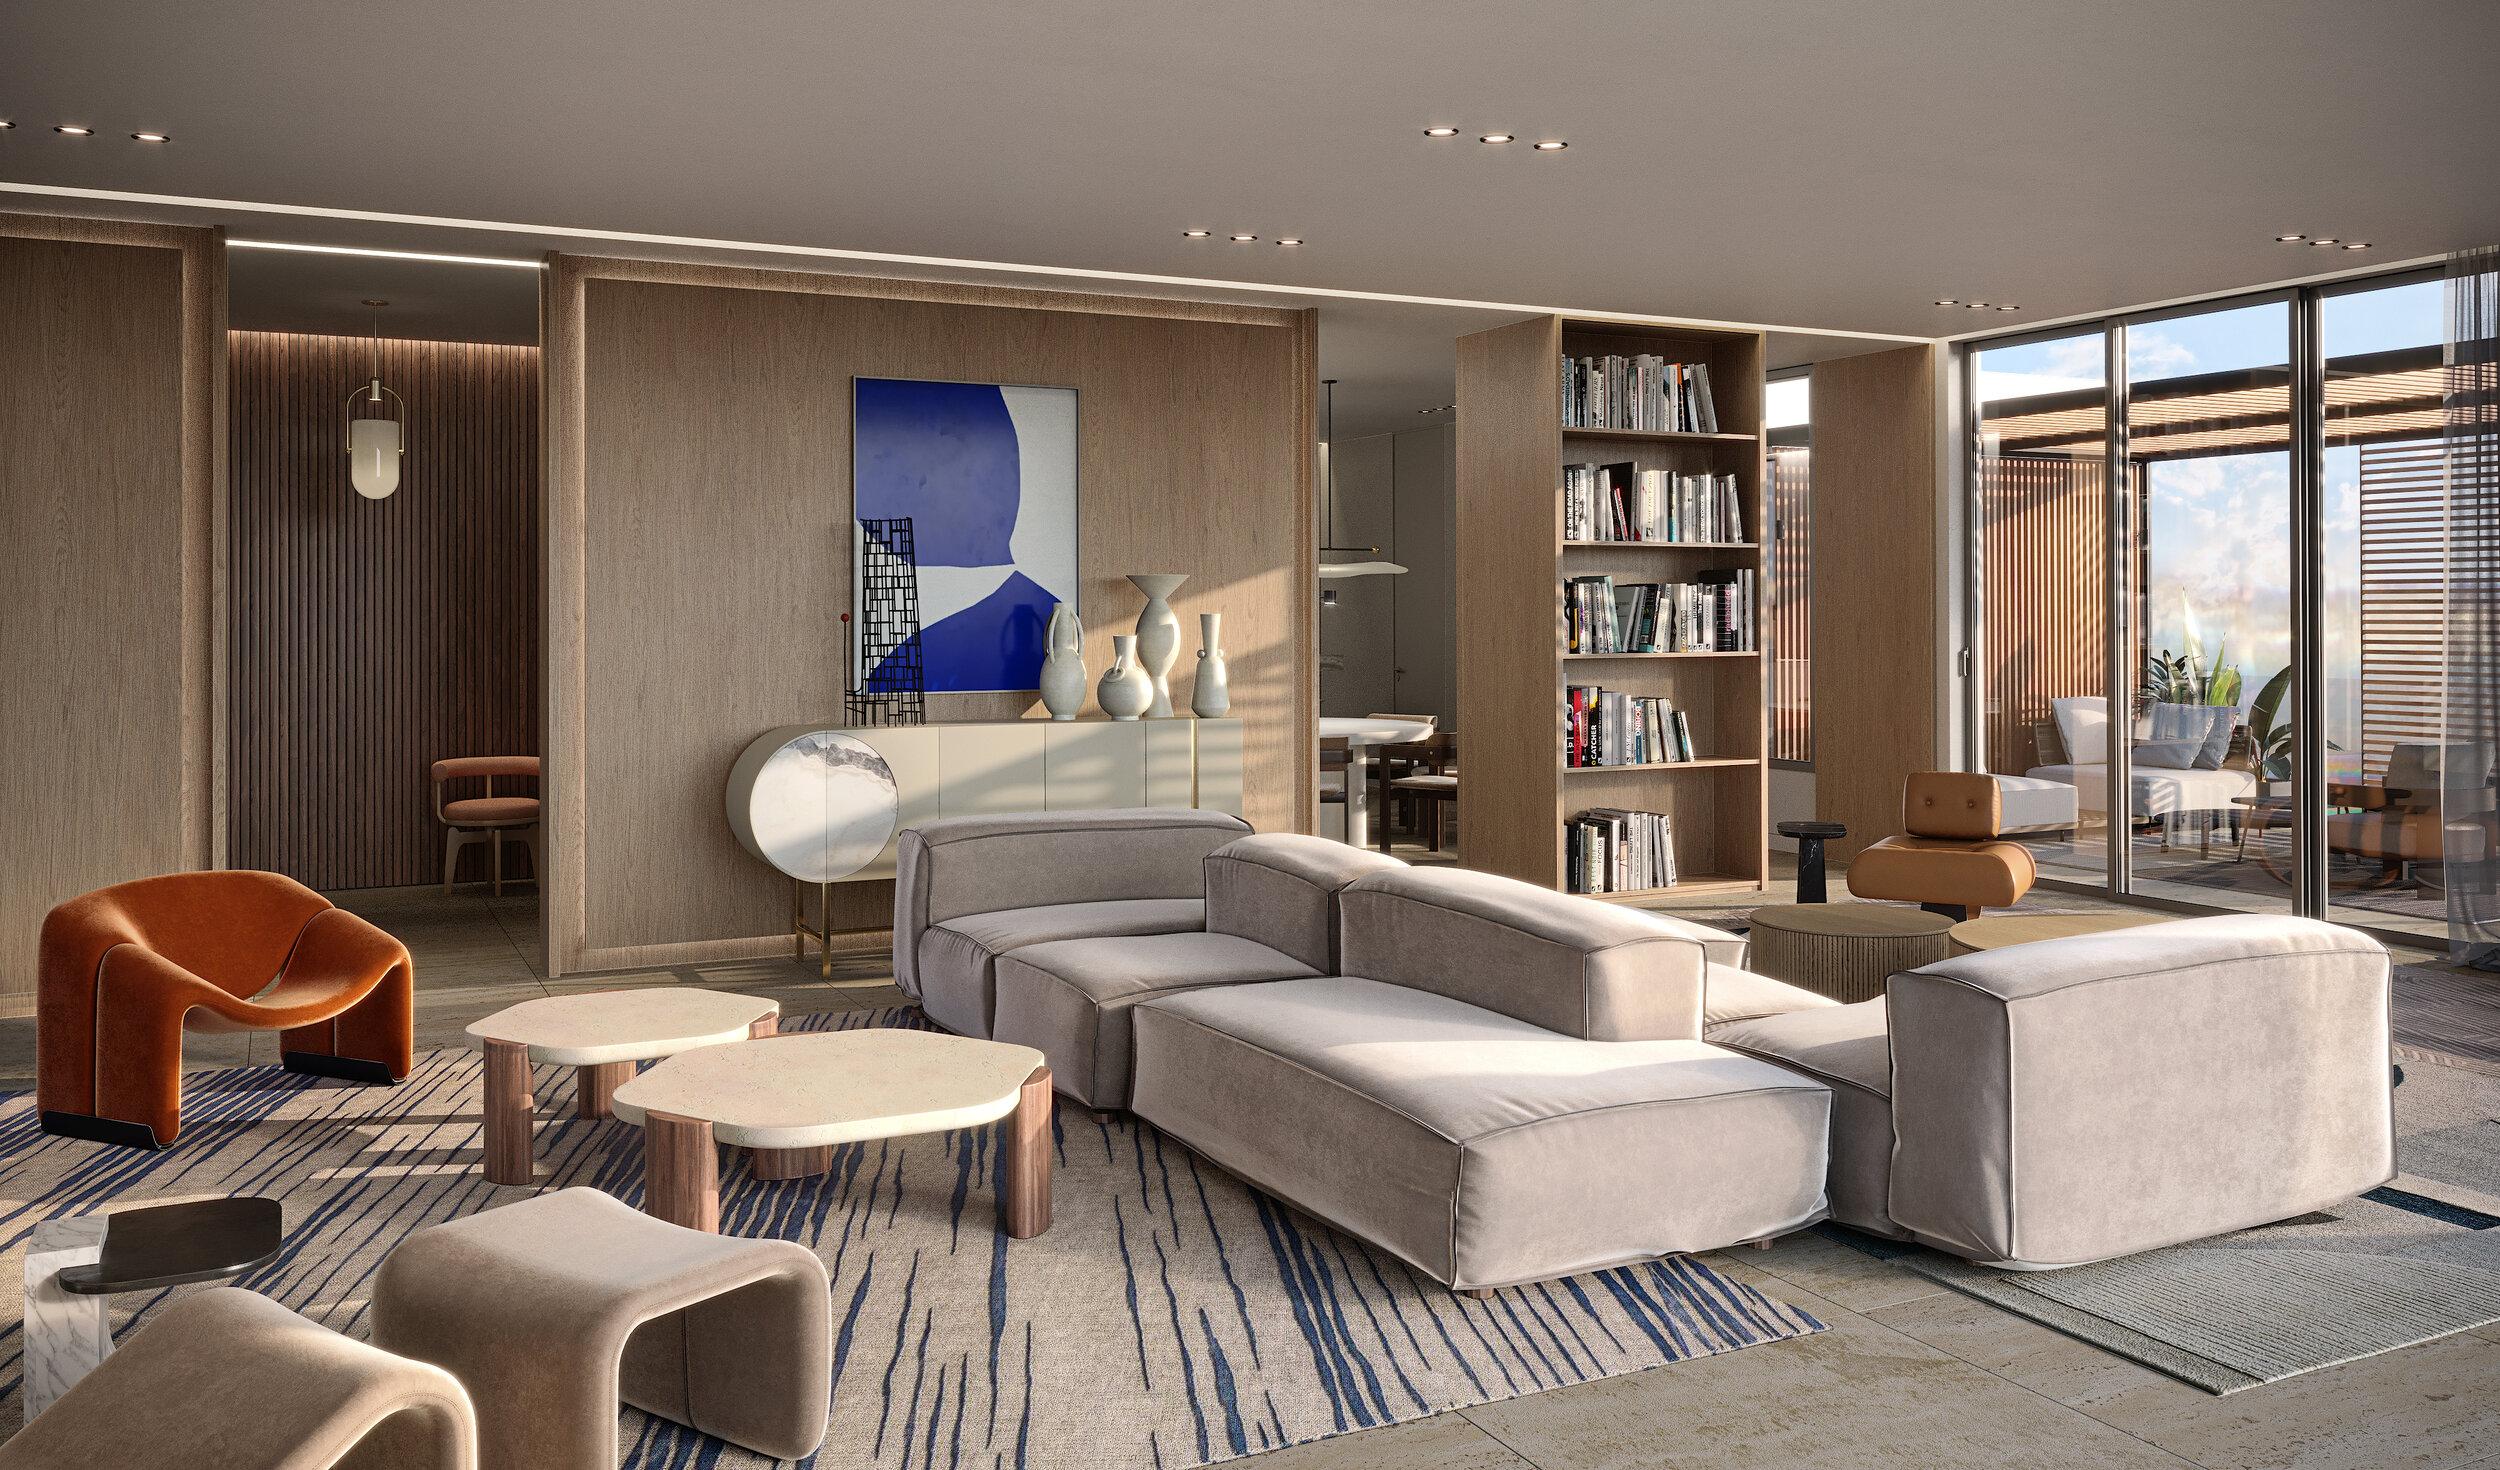 Living room light previa.jpg